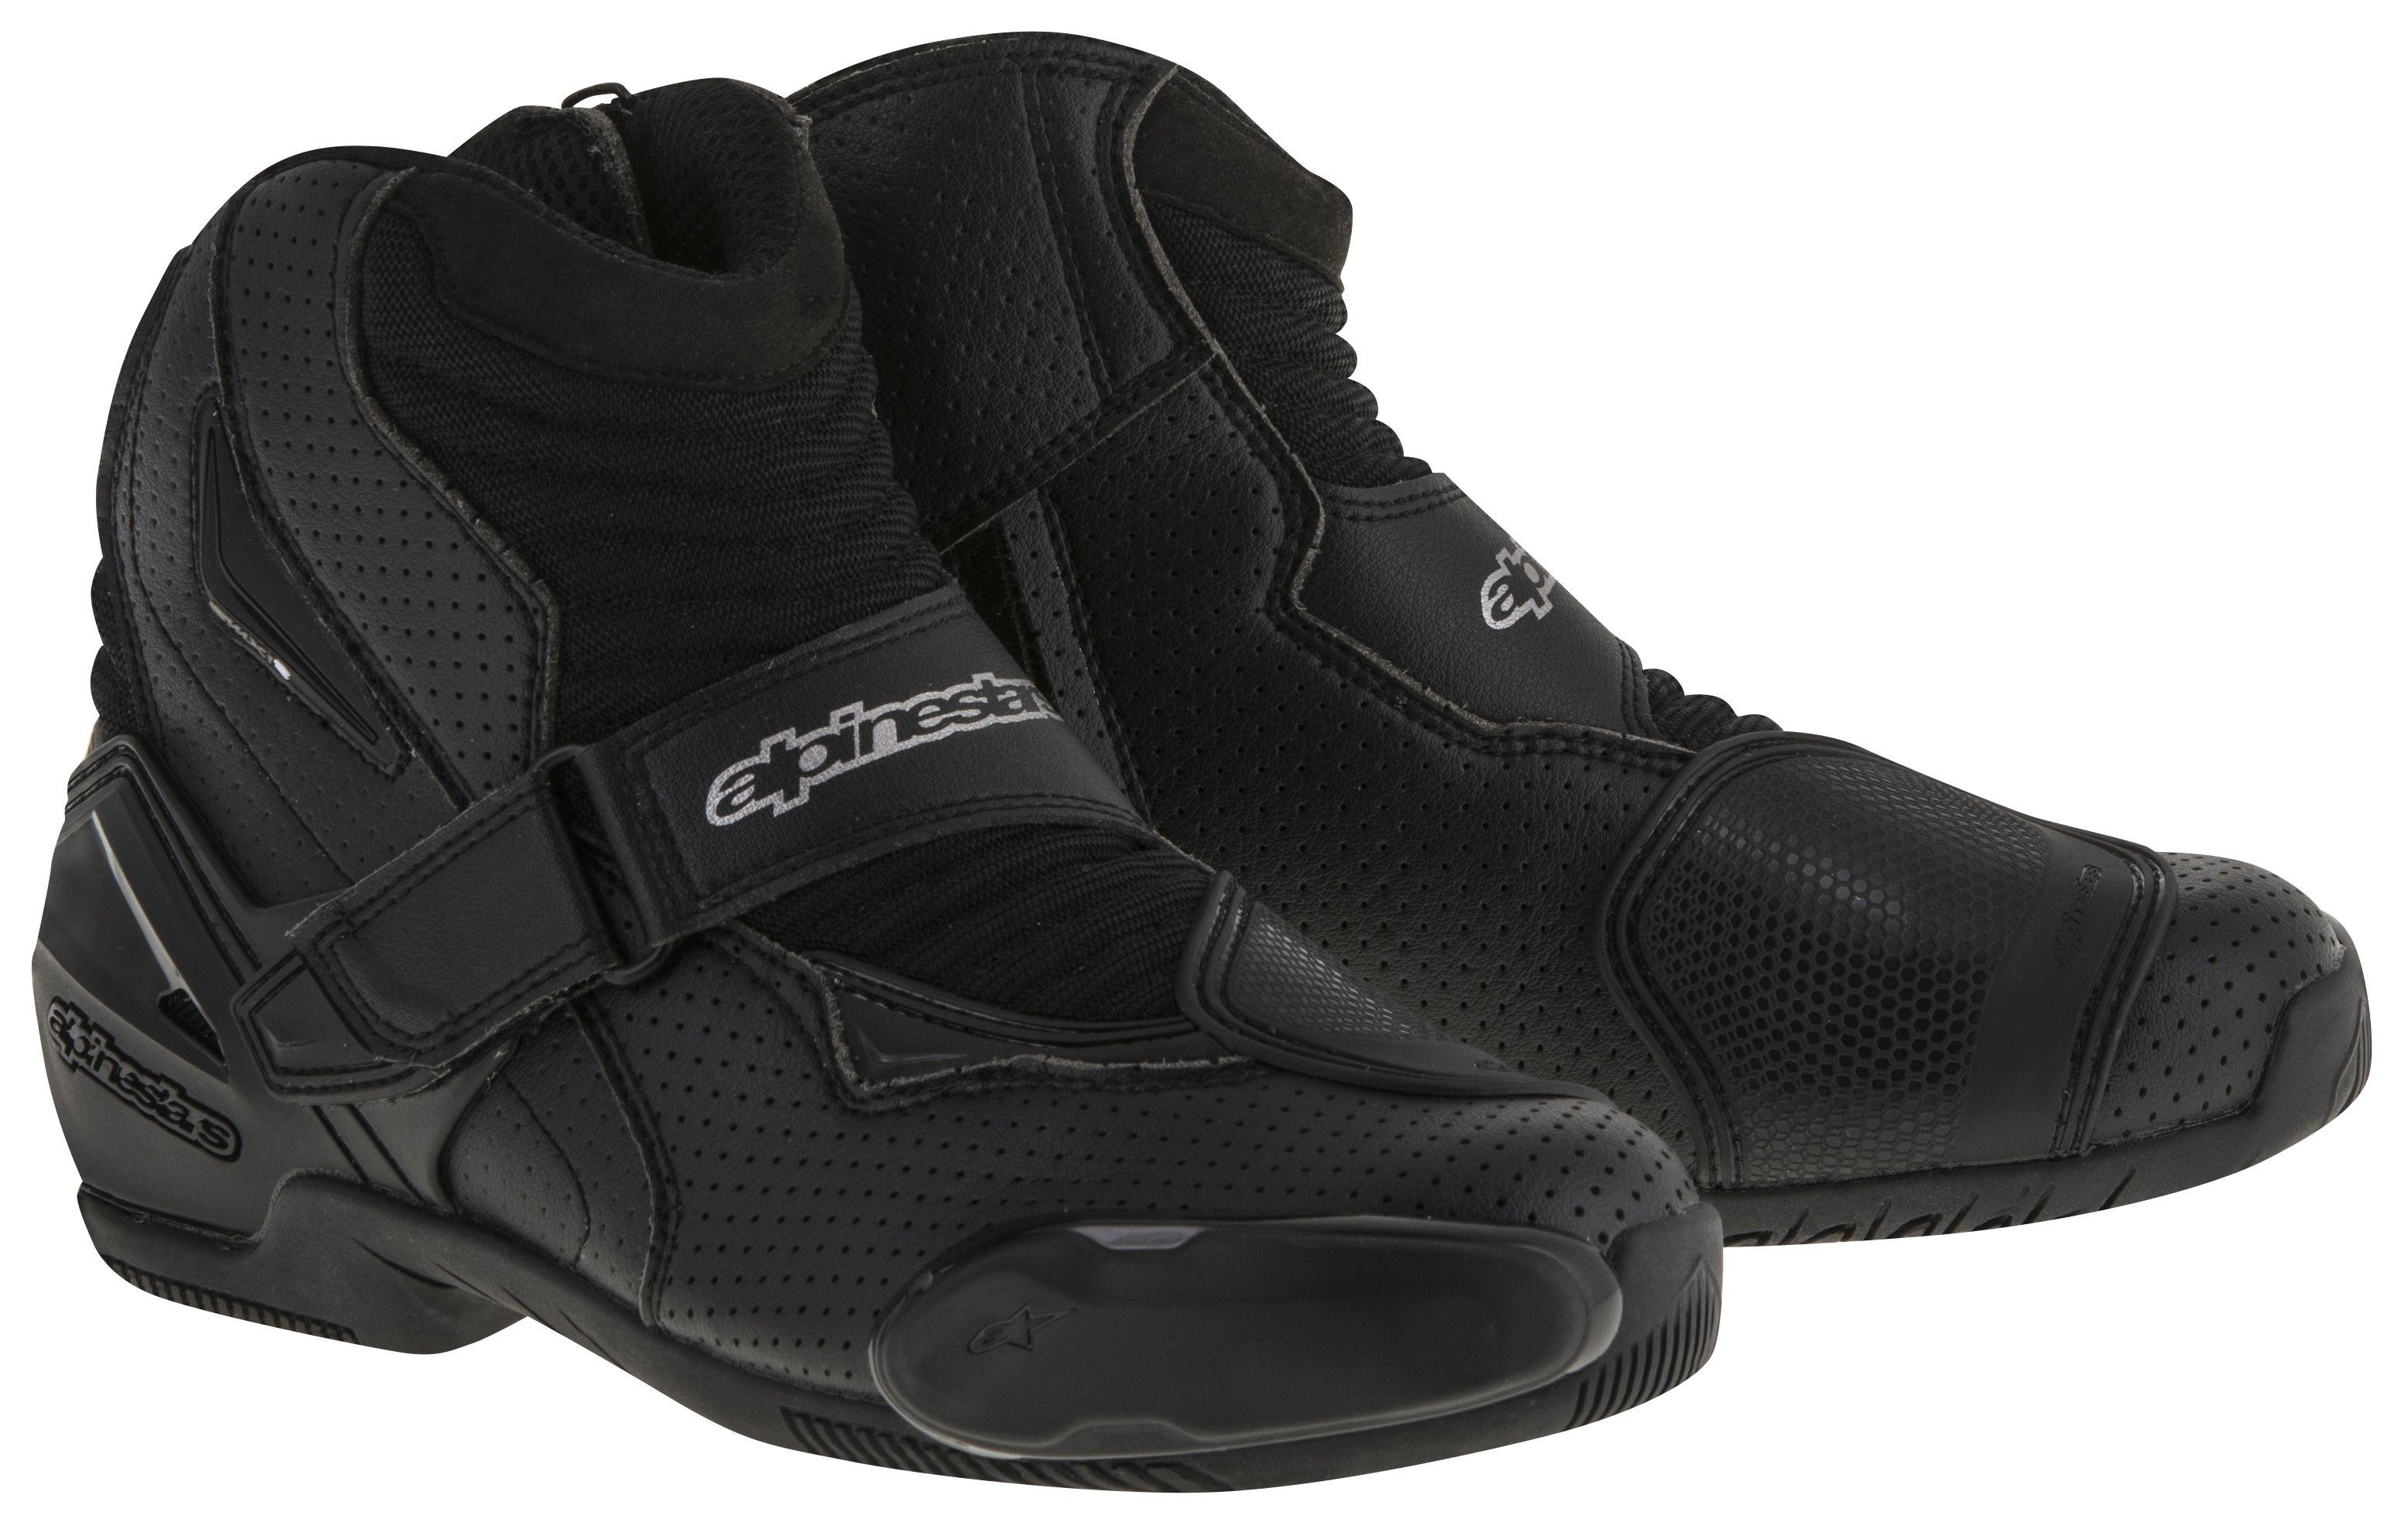 Alpinestars Smx 1 R Vented Boots Revzilla